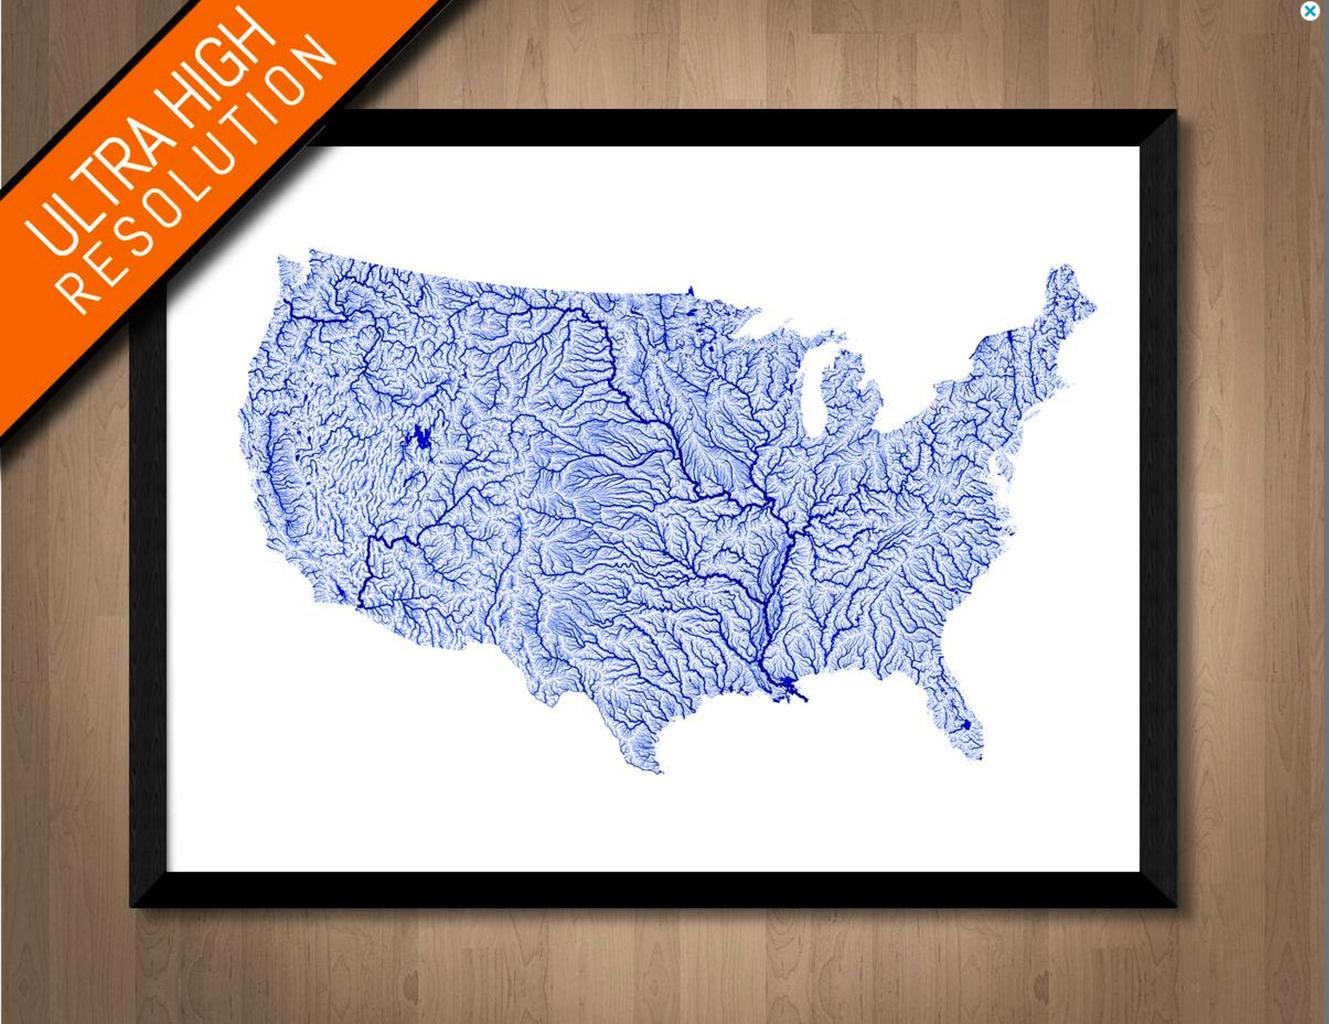 Illuminated Waterways of the United States Map